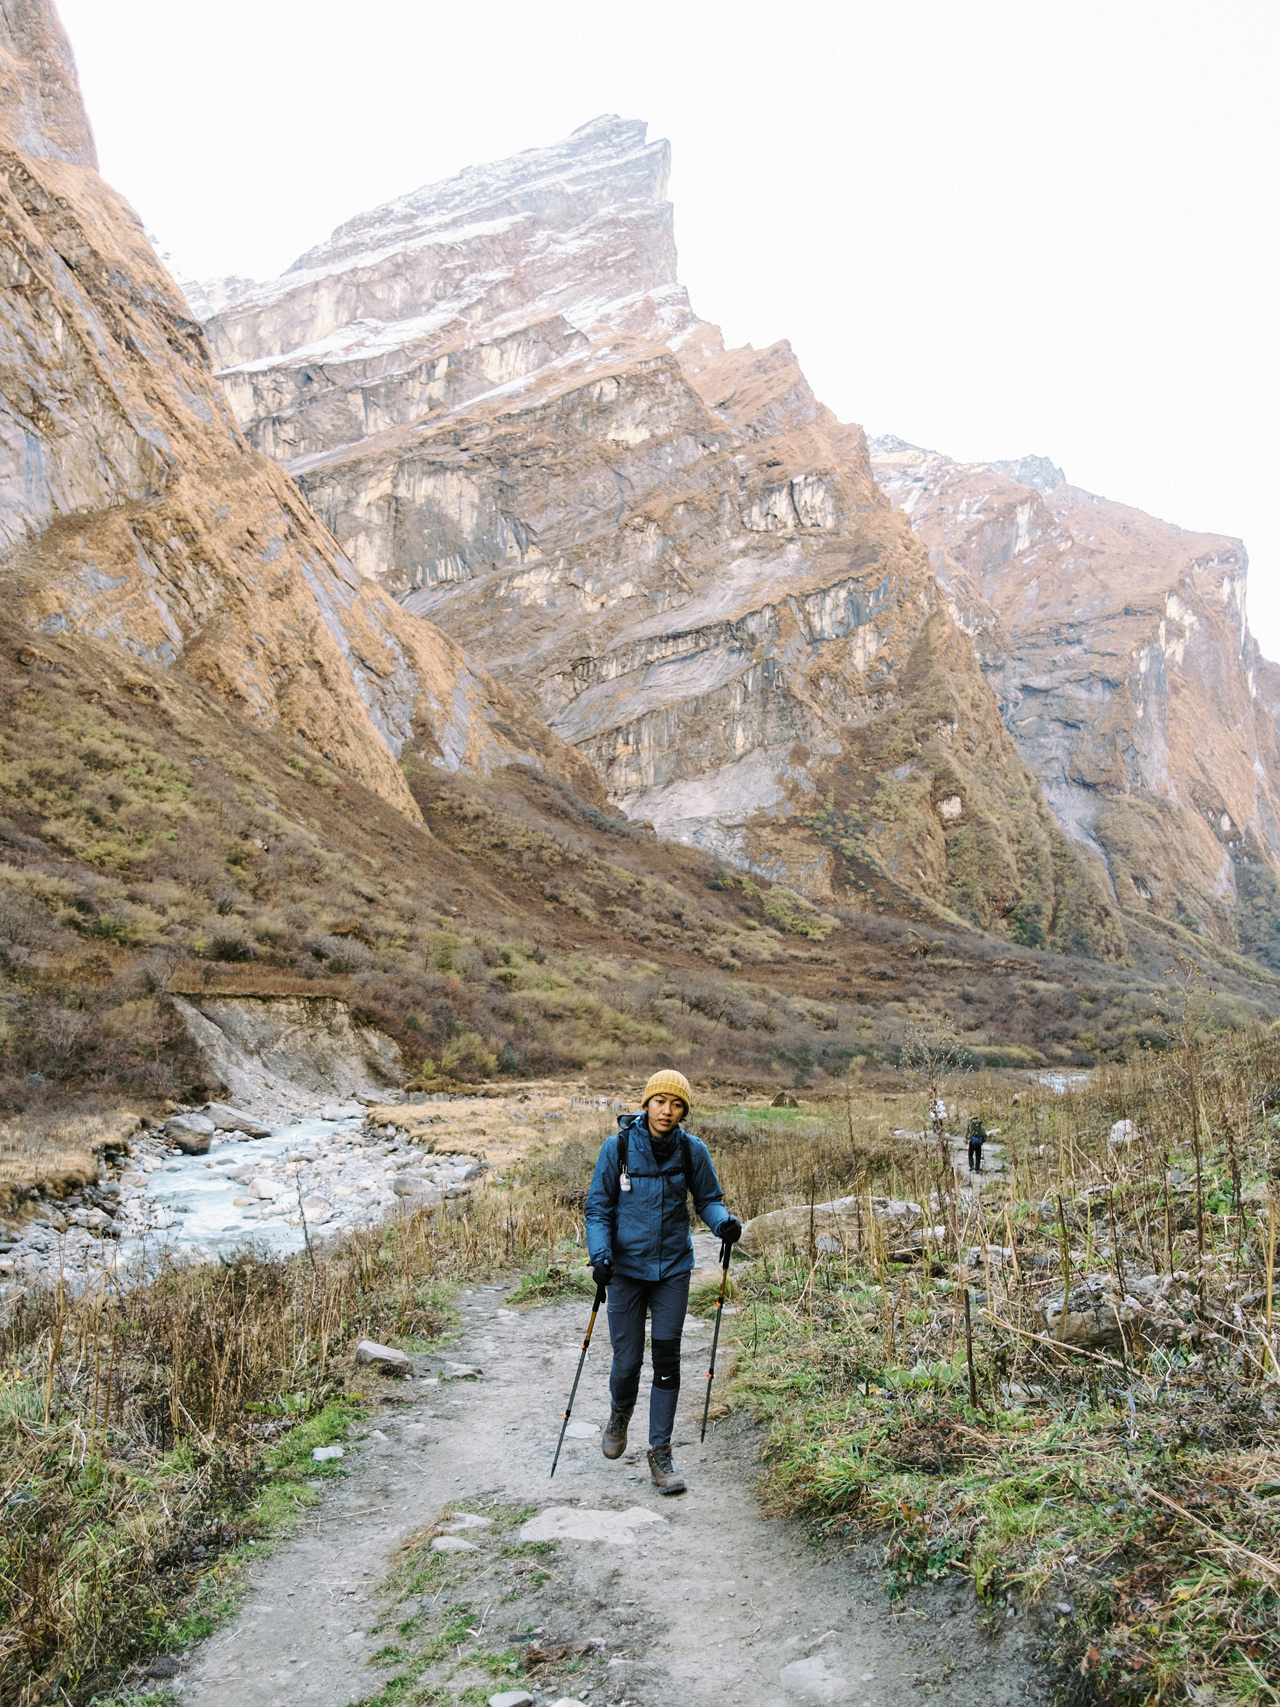 Nepal 2019 - Trekking Annapurna Base Camp 115